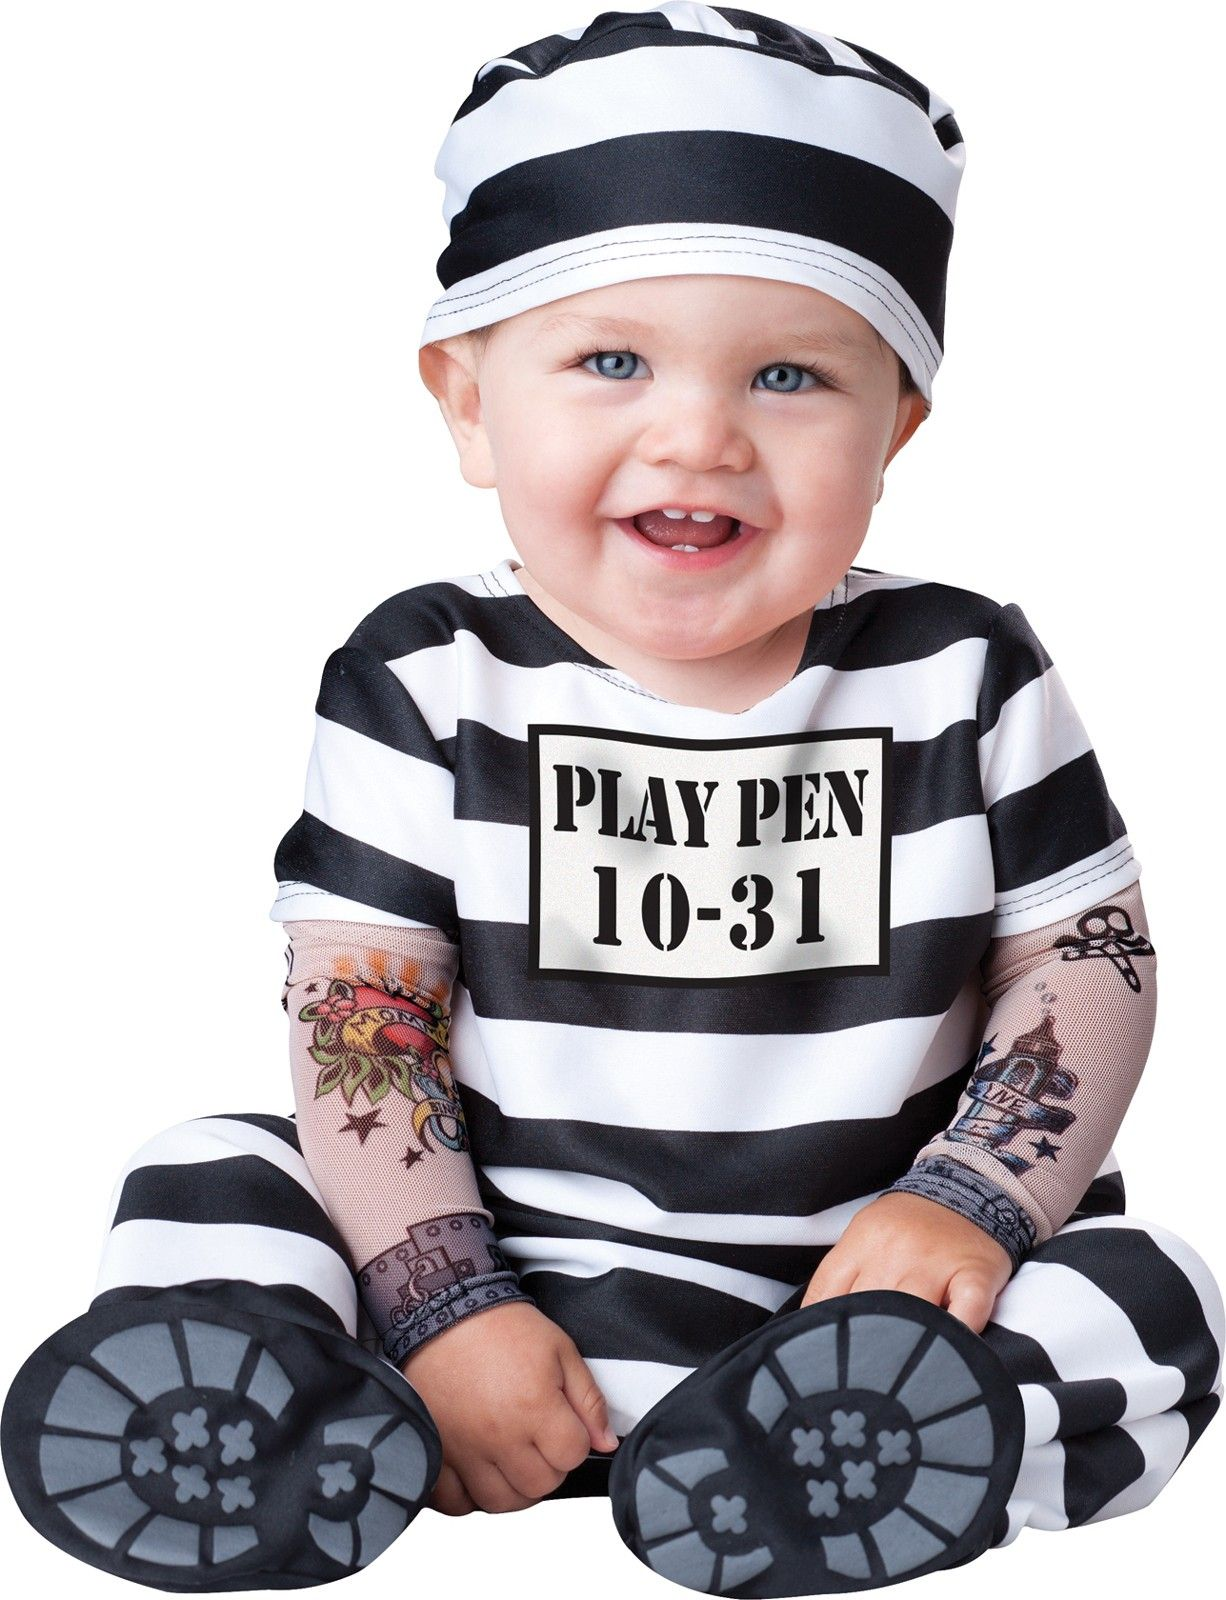 Baby Pirate Convict Biker Costume Kids Prisoner Girls Boys Fancy Dress Outfit